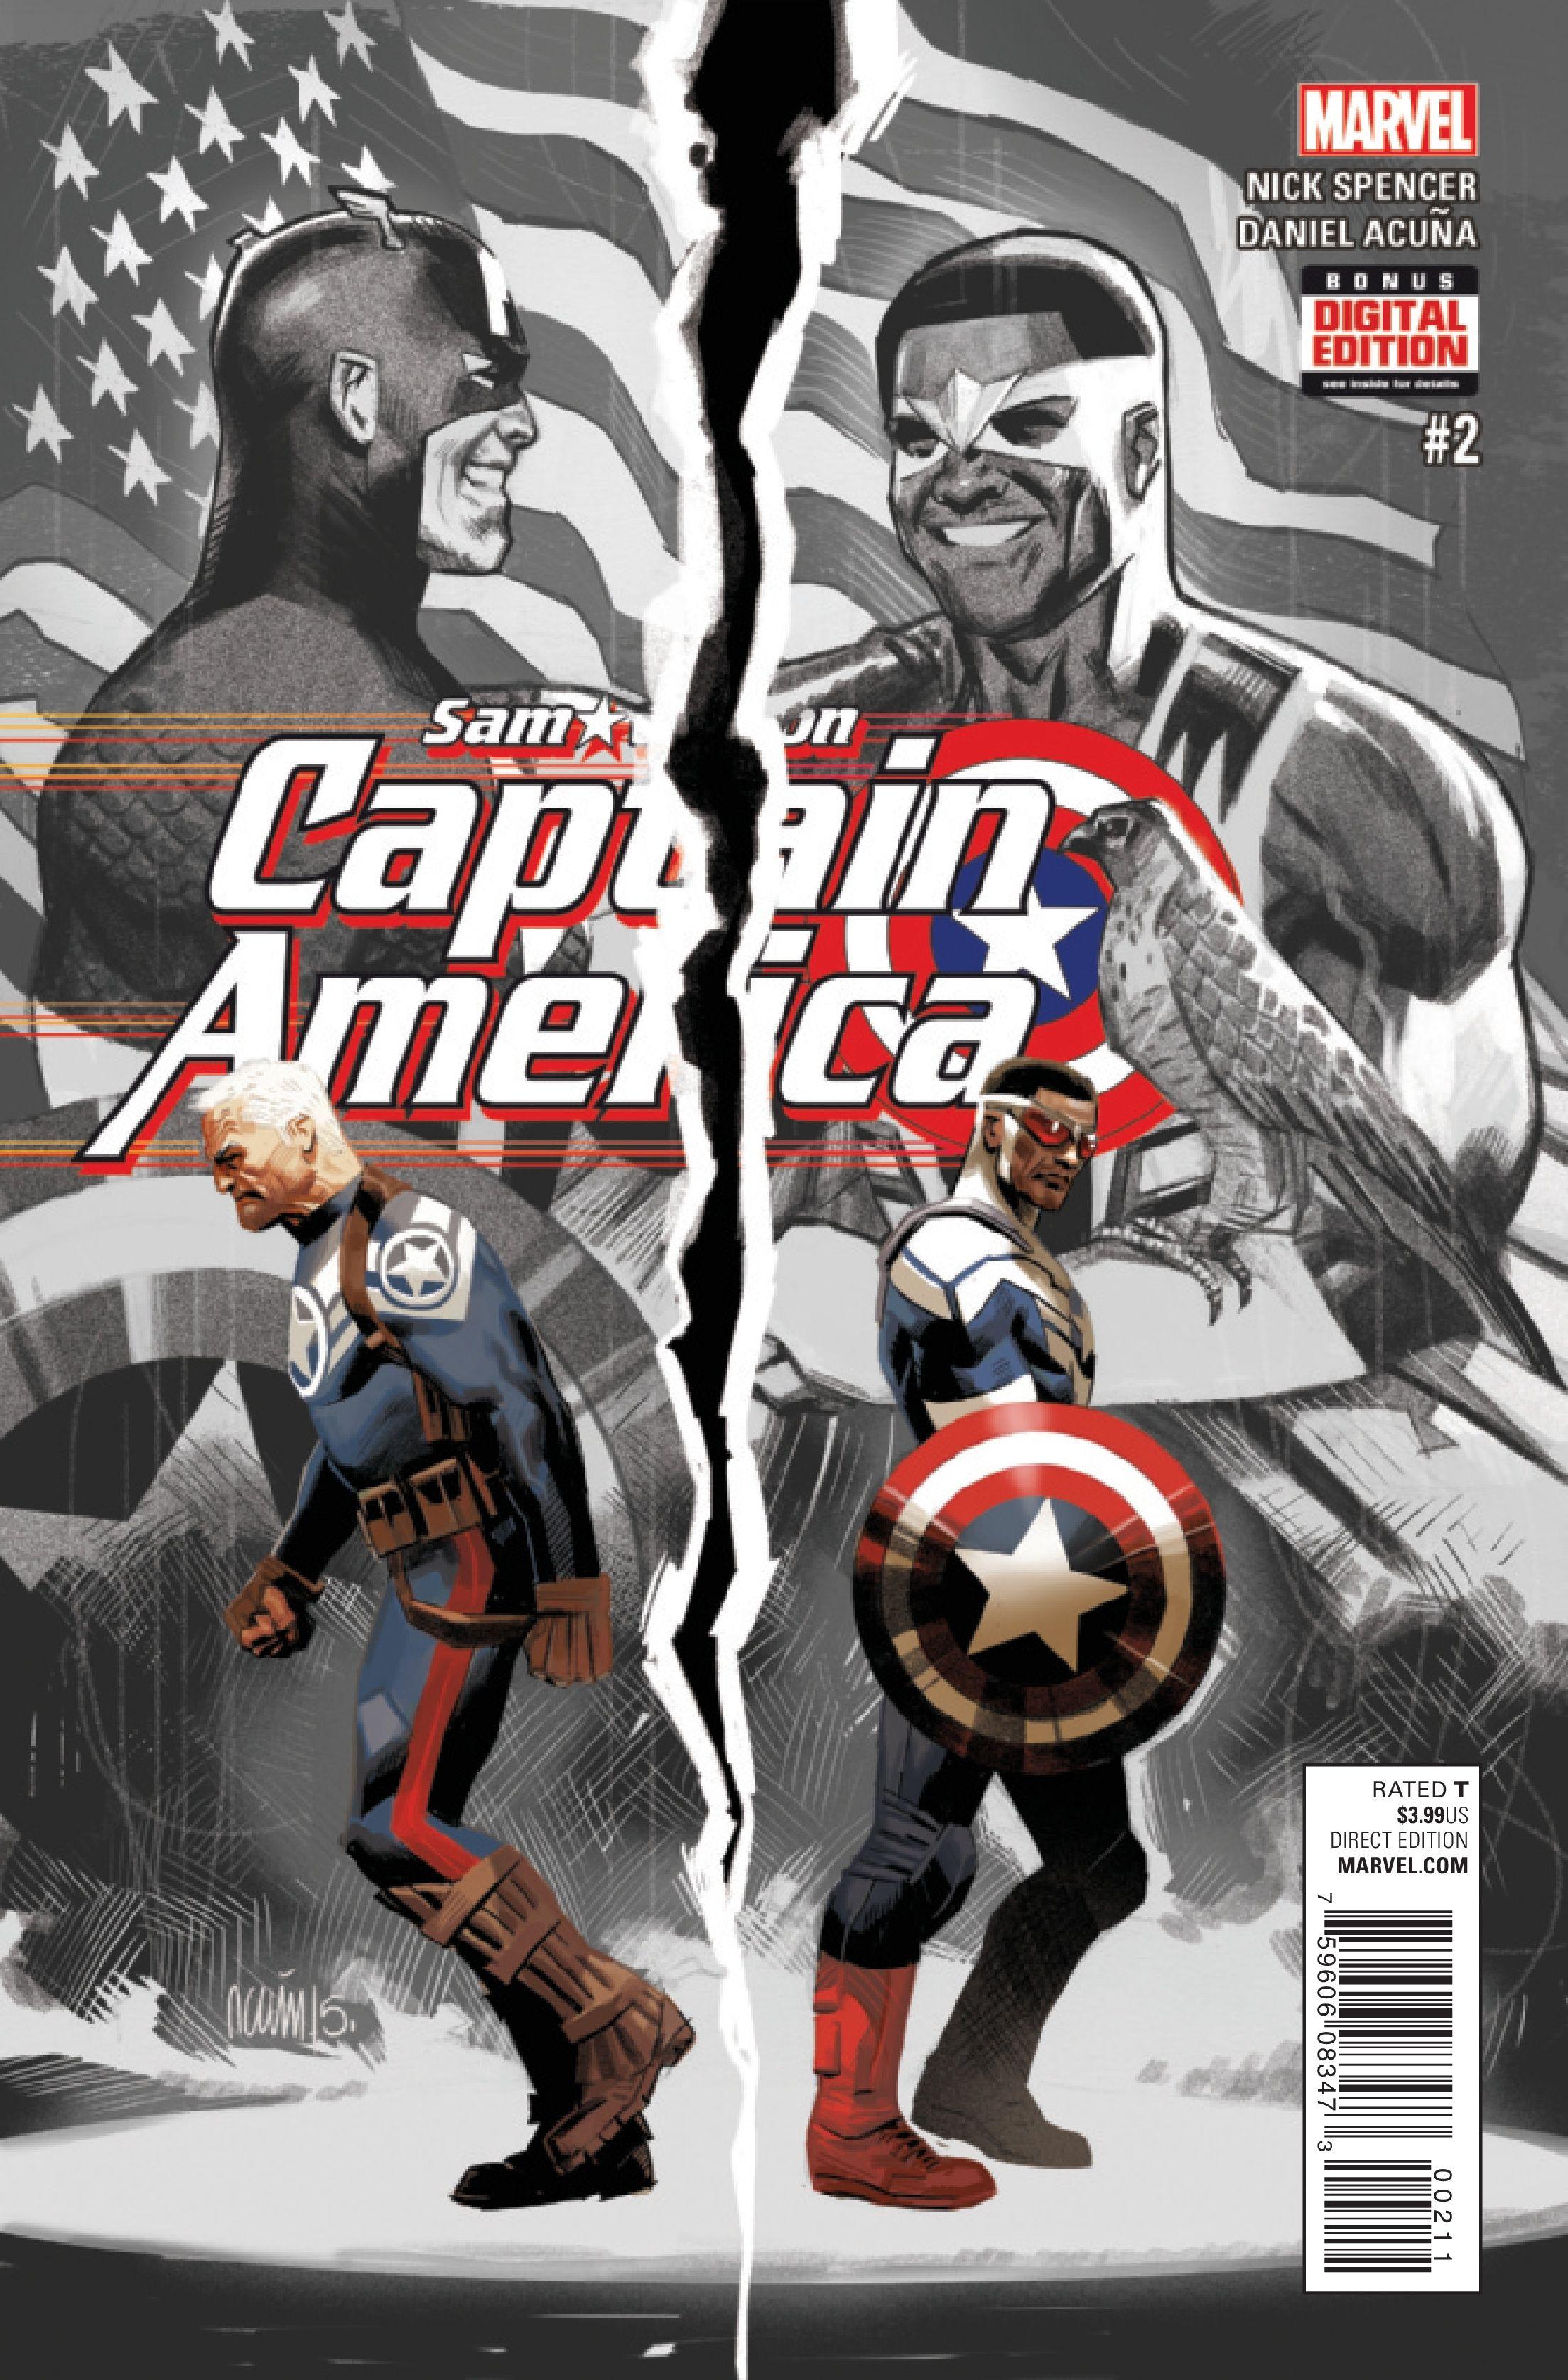 Preview: CAPTAIN AMERICA SAM WILSON #2 - Comic Vine